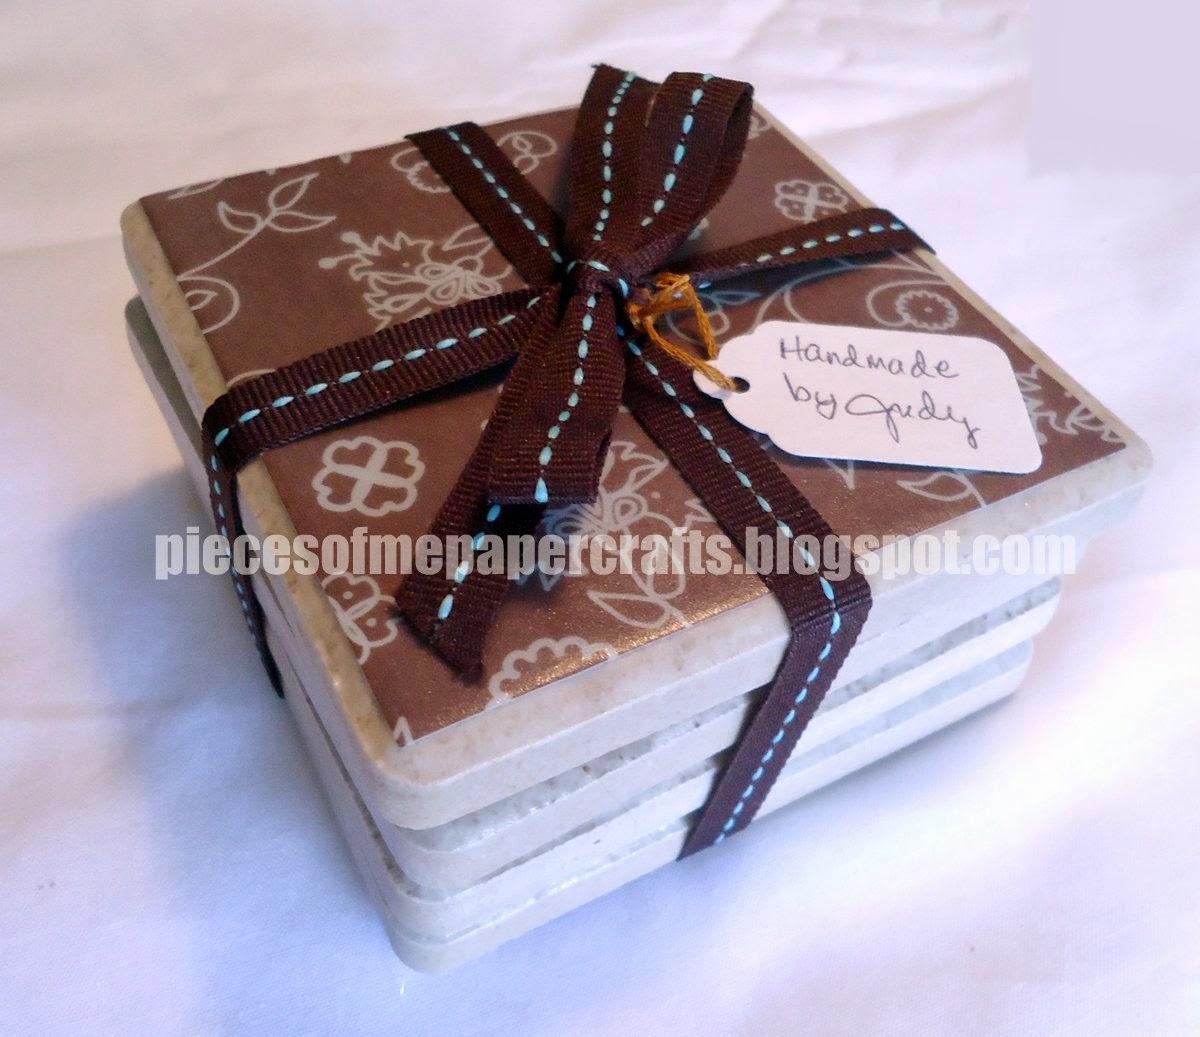 Pieces of me scrapbooking paper crafts tutorial diy ceramic ceramic tile coasters dailygadgetfo Image collections